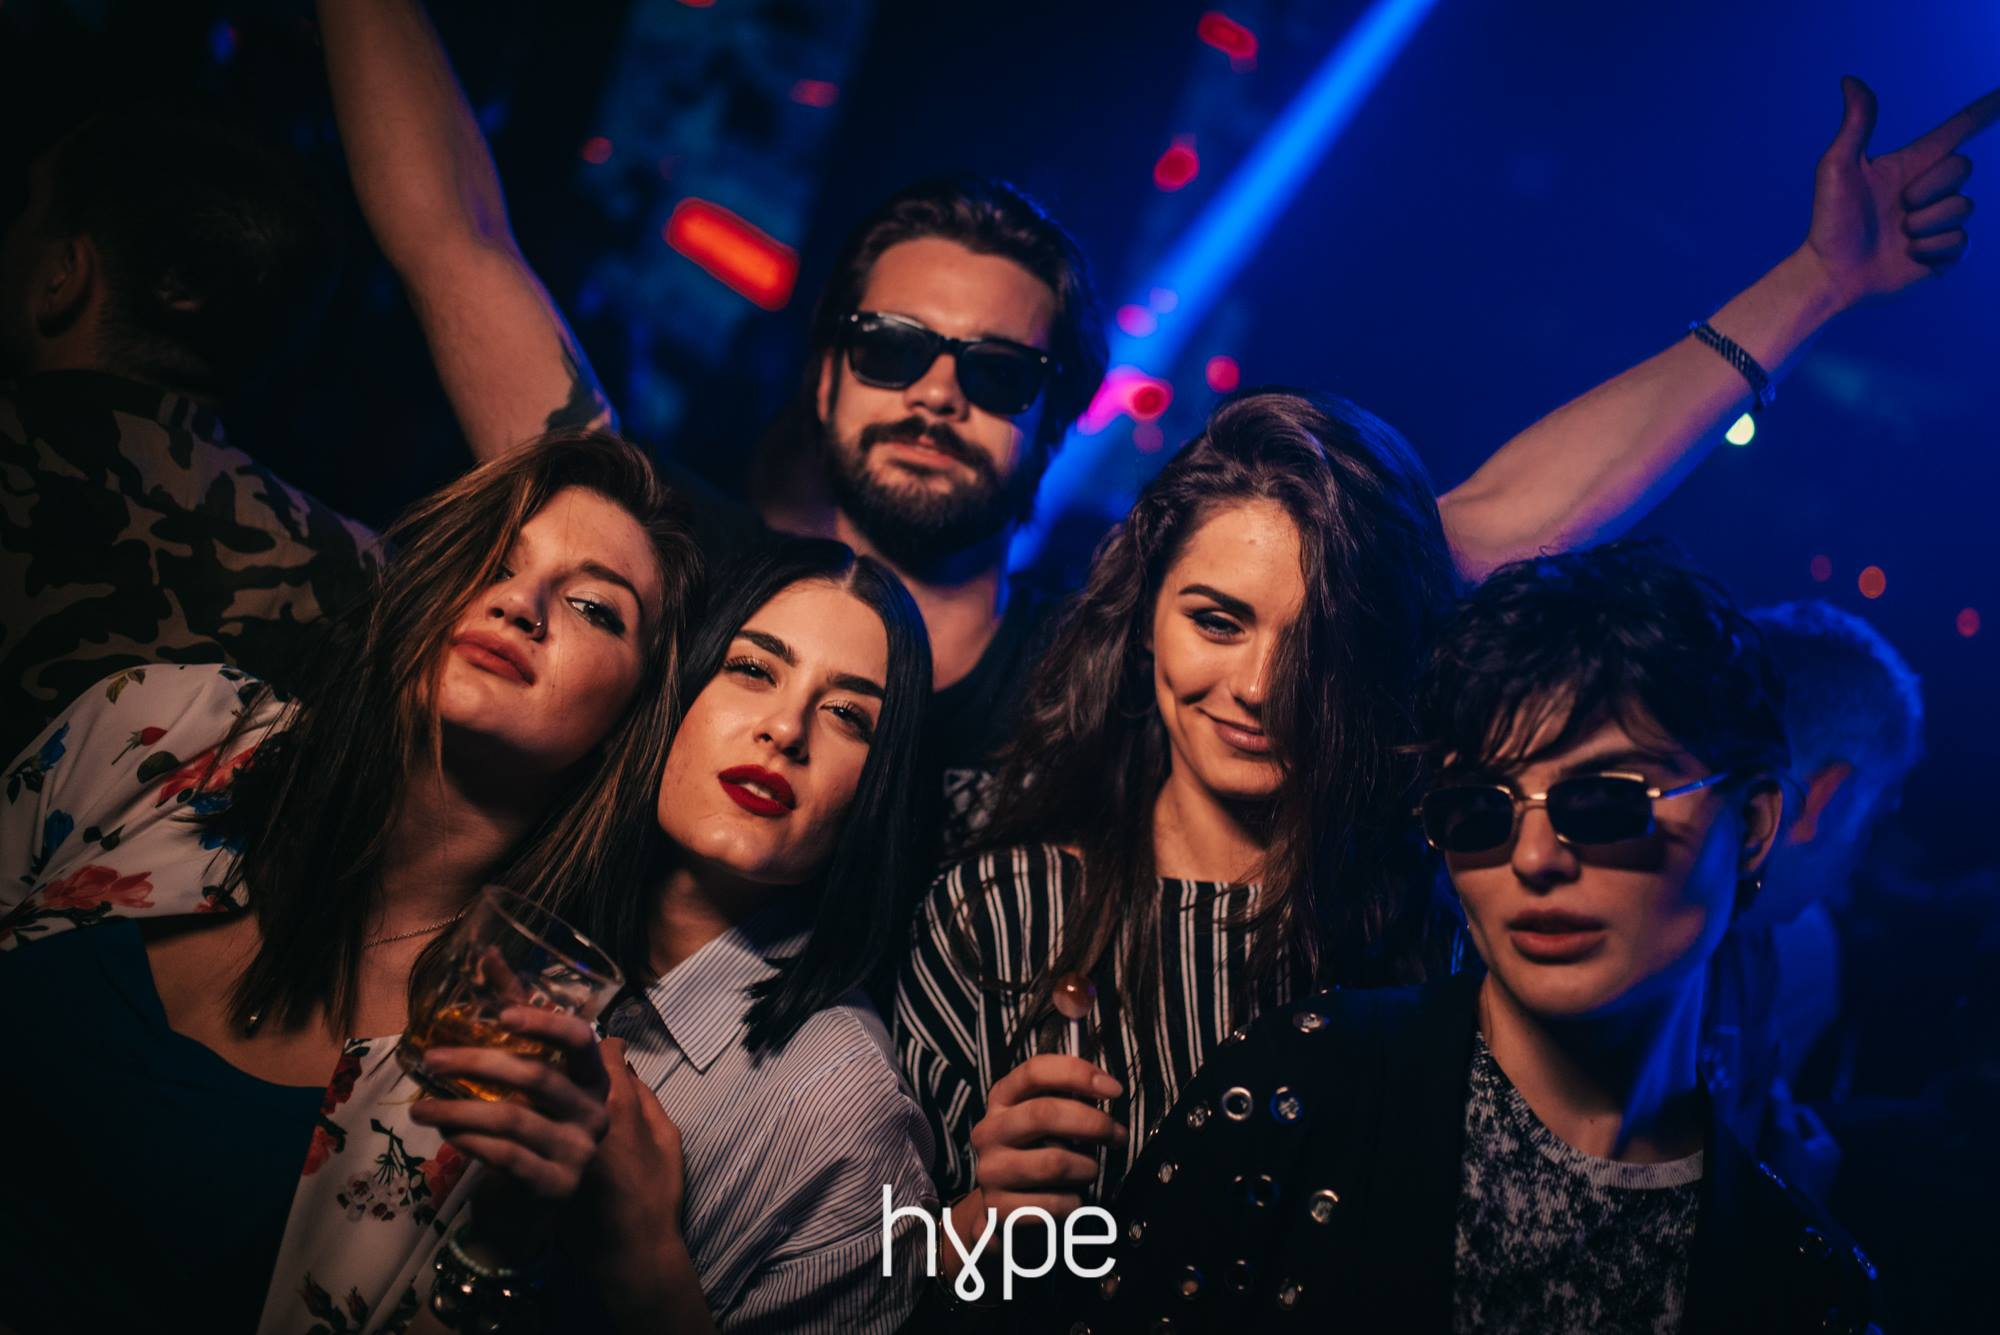 Hype ponovo otvara vrata najluđih žurki do jutra!